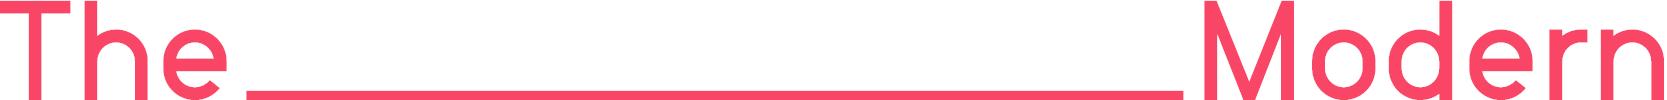 TheModern_Logo_x2Length_RGB.png